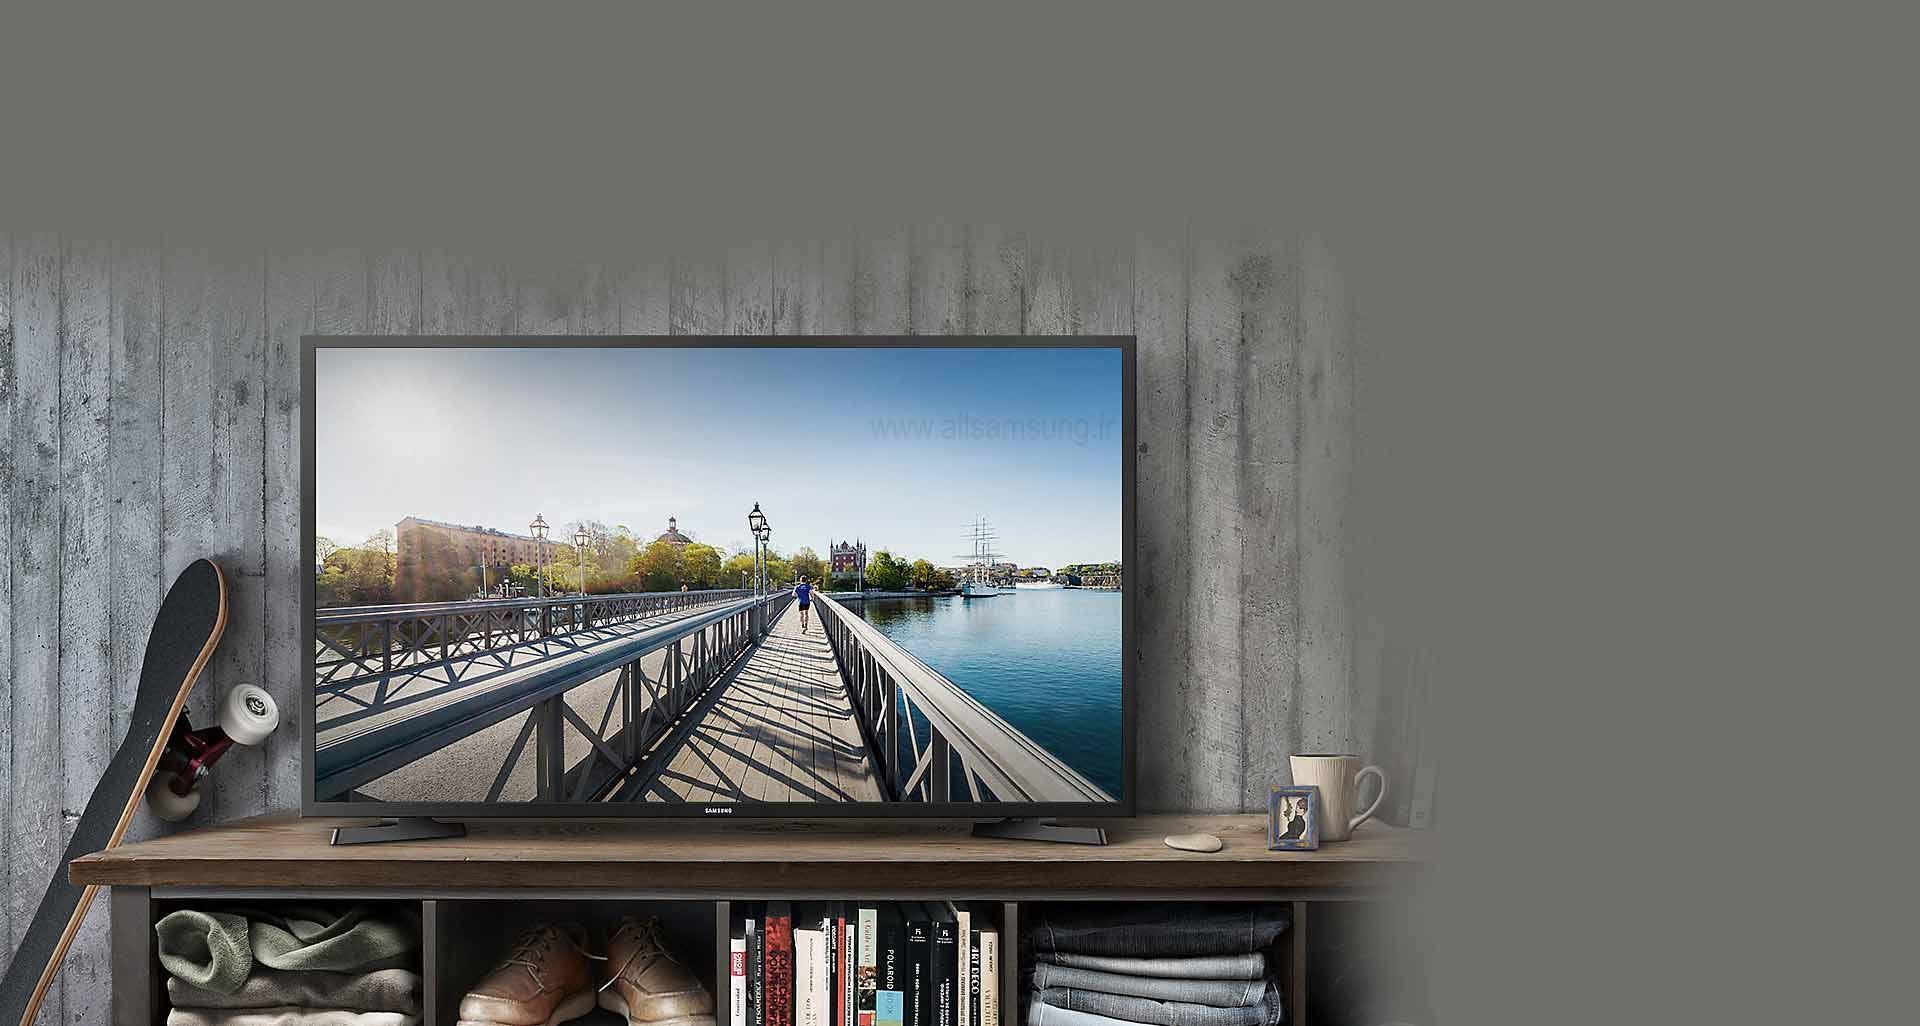 تجربه تصویر اچ دی بی نظیر با تلویزیون N5550